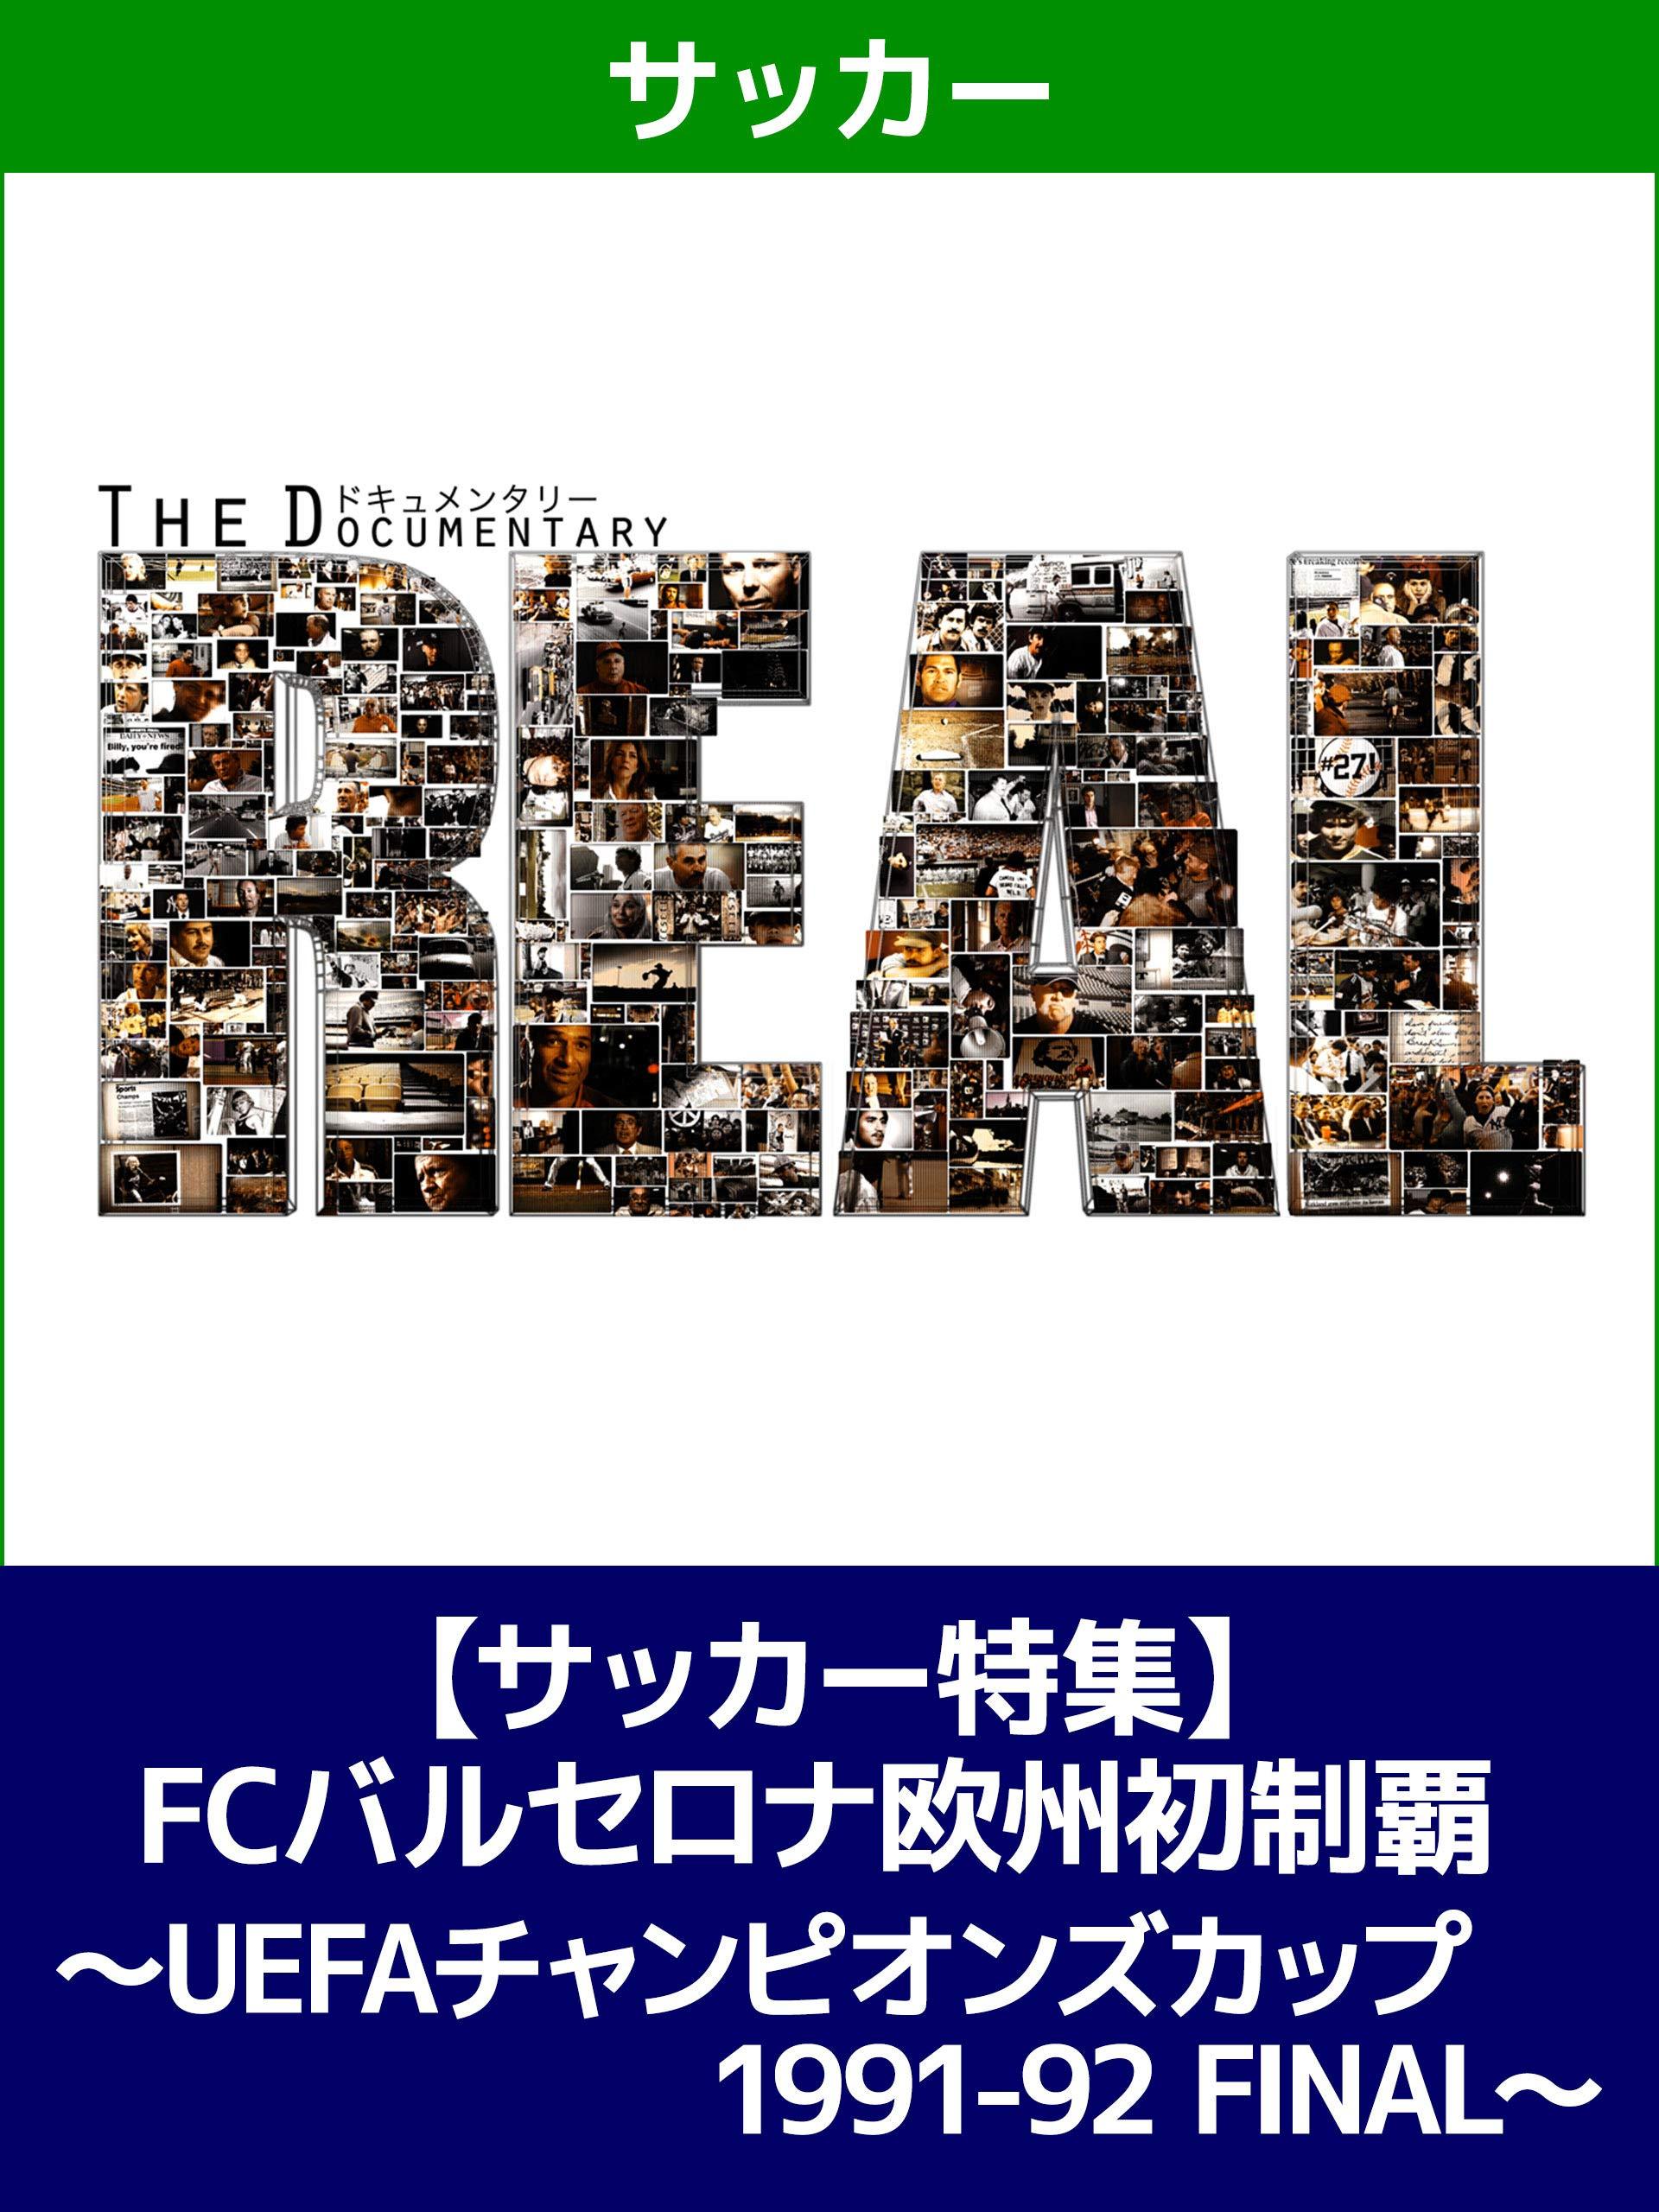 Amazon.co.jp: ドキュメンタリー ~The REAL~ 【サッカー特集】 FC ...